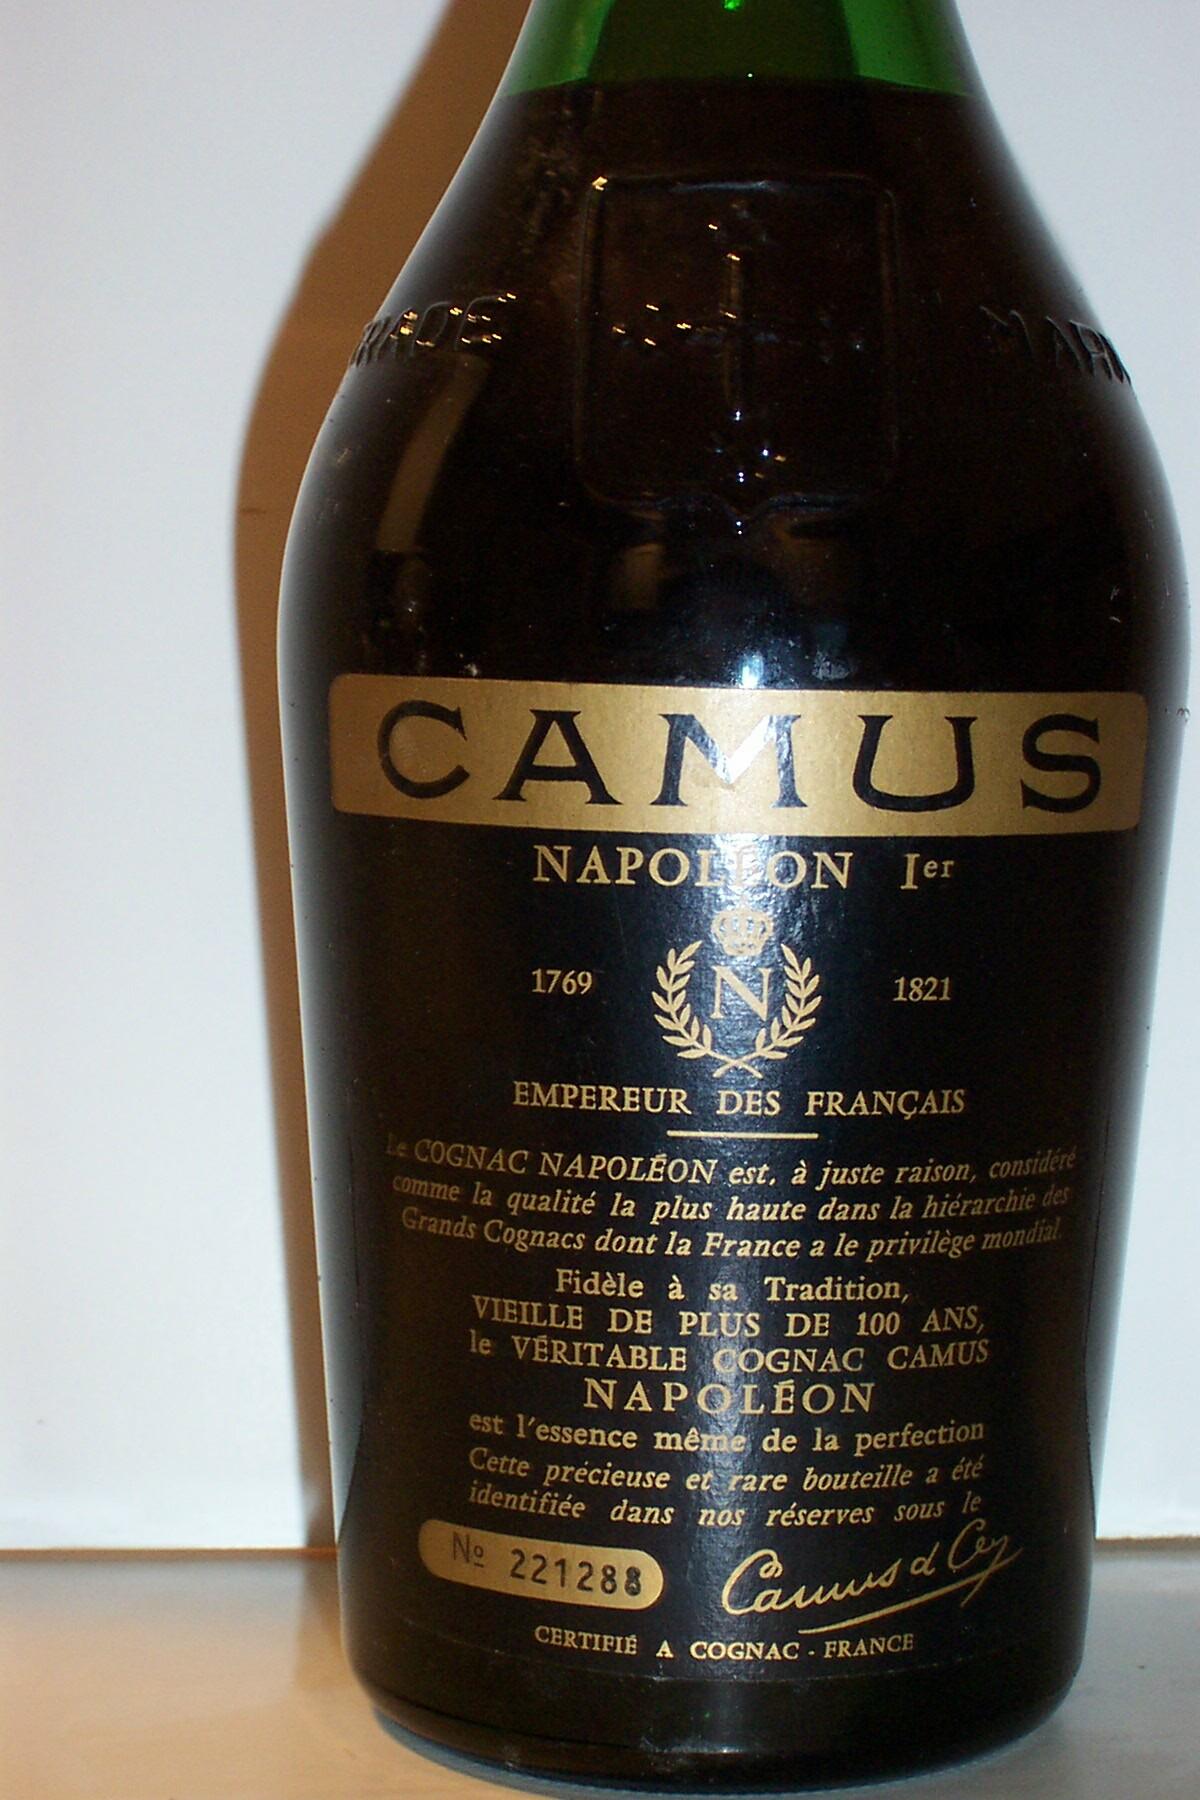 Cognac Camus backside label